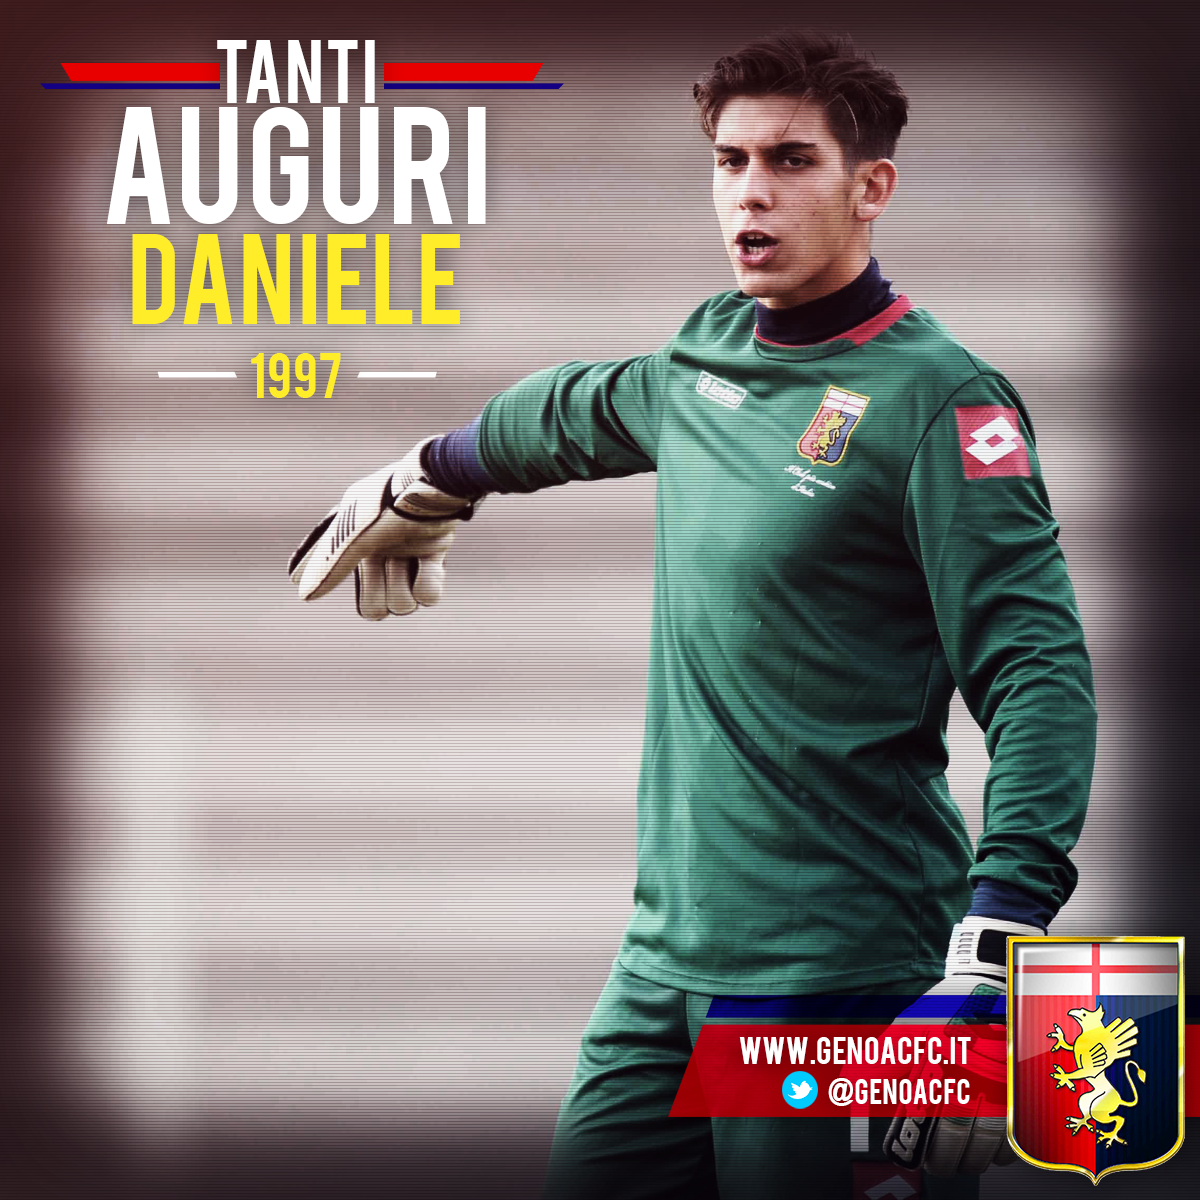 Genoa Cfc On Twitter Buon Compleanno Daniele Happybdaygrifone